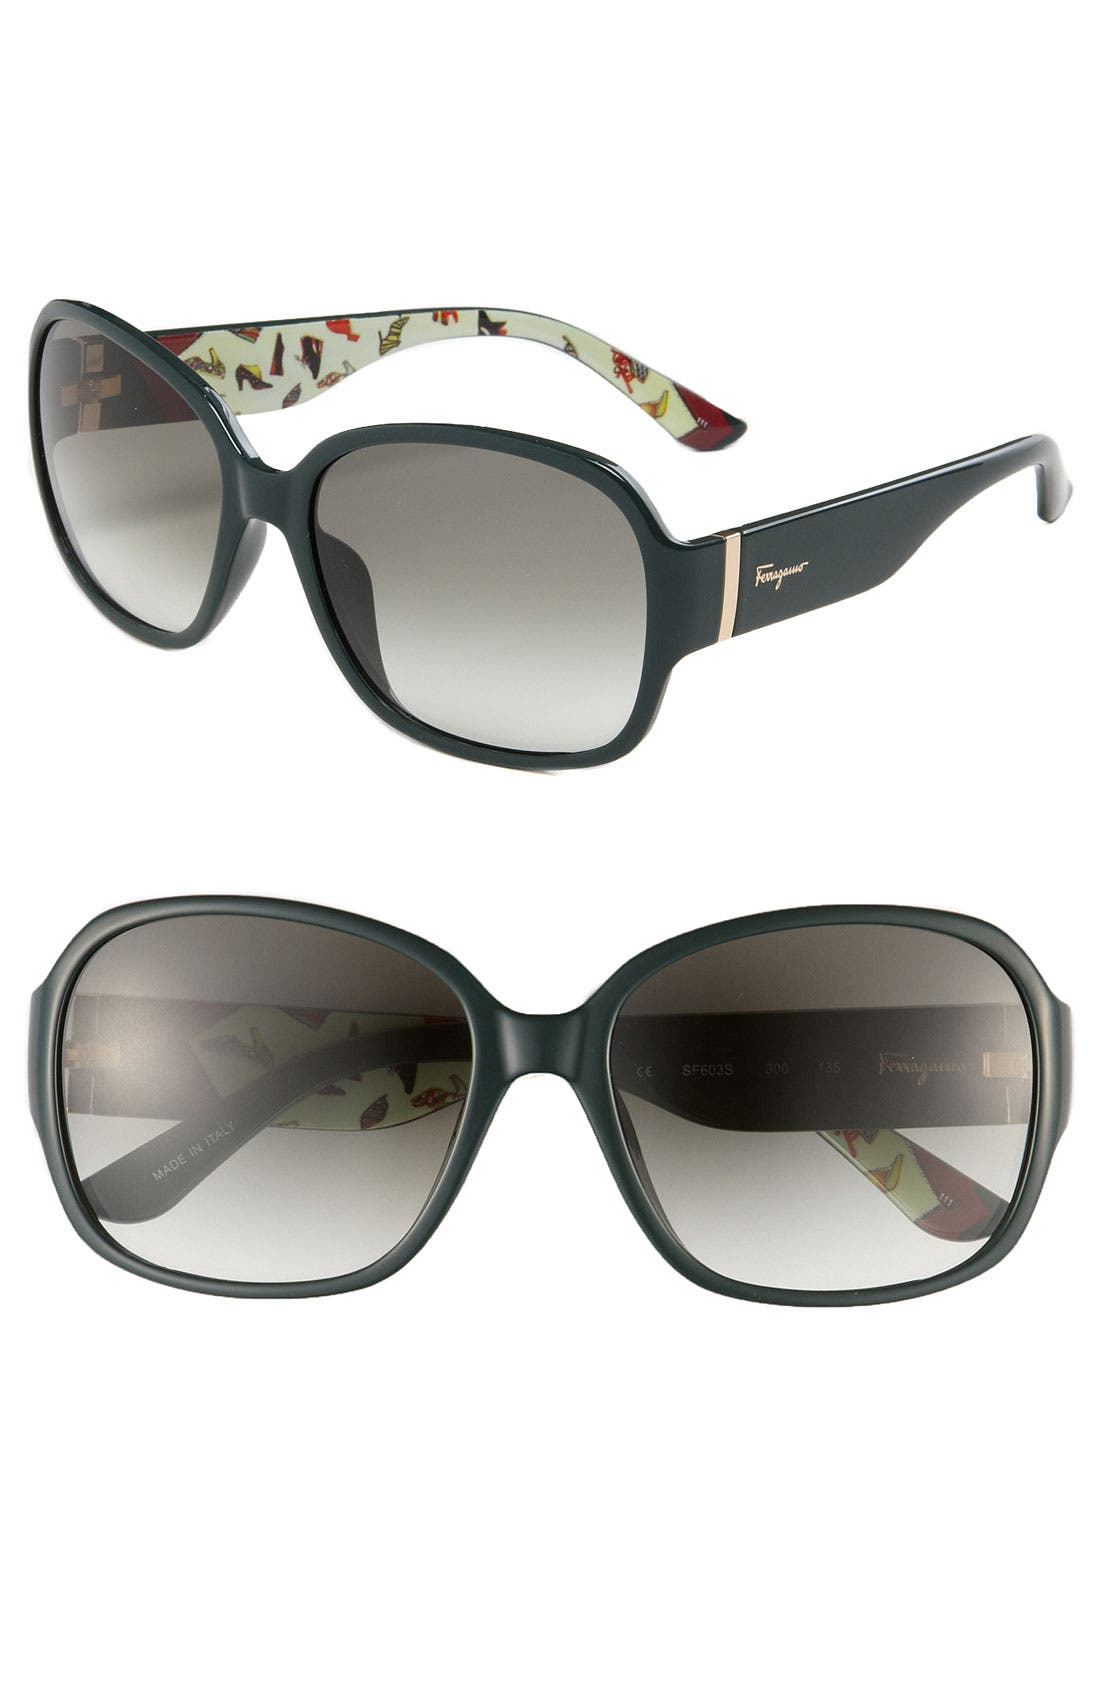 Main Image - Salvatore Ferragamo Sunglasses